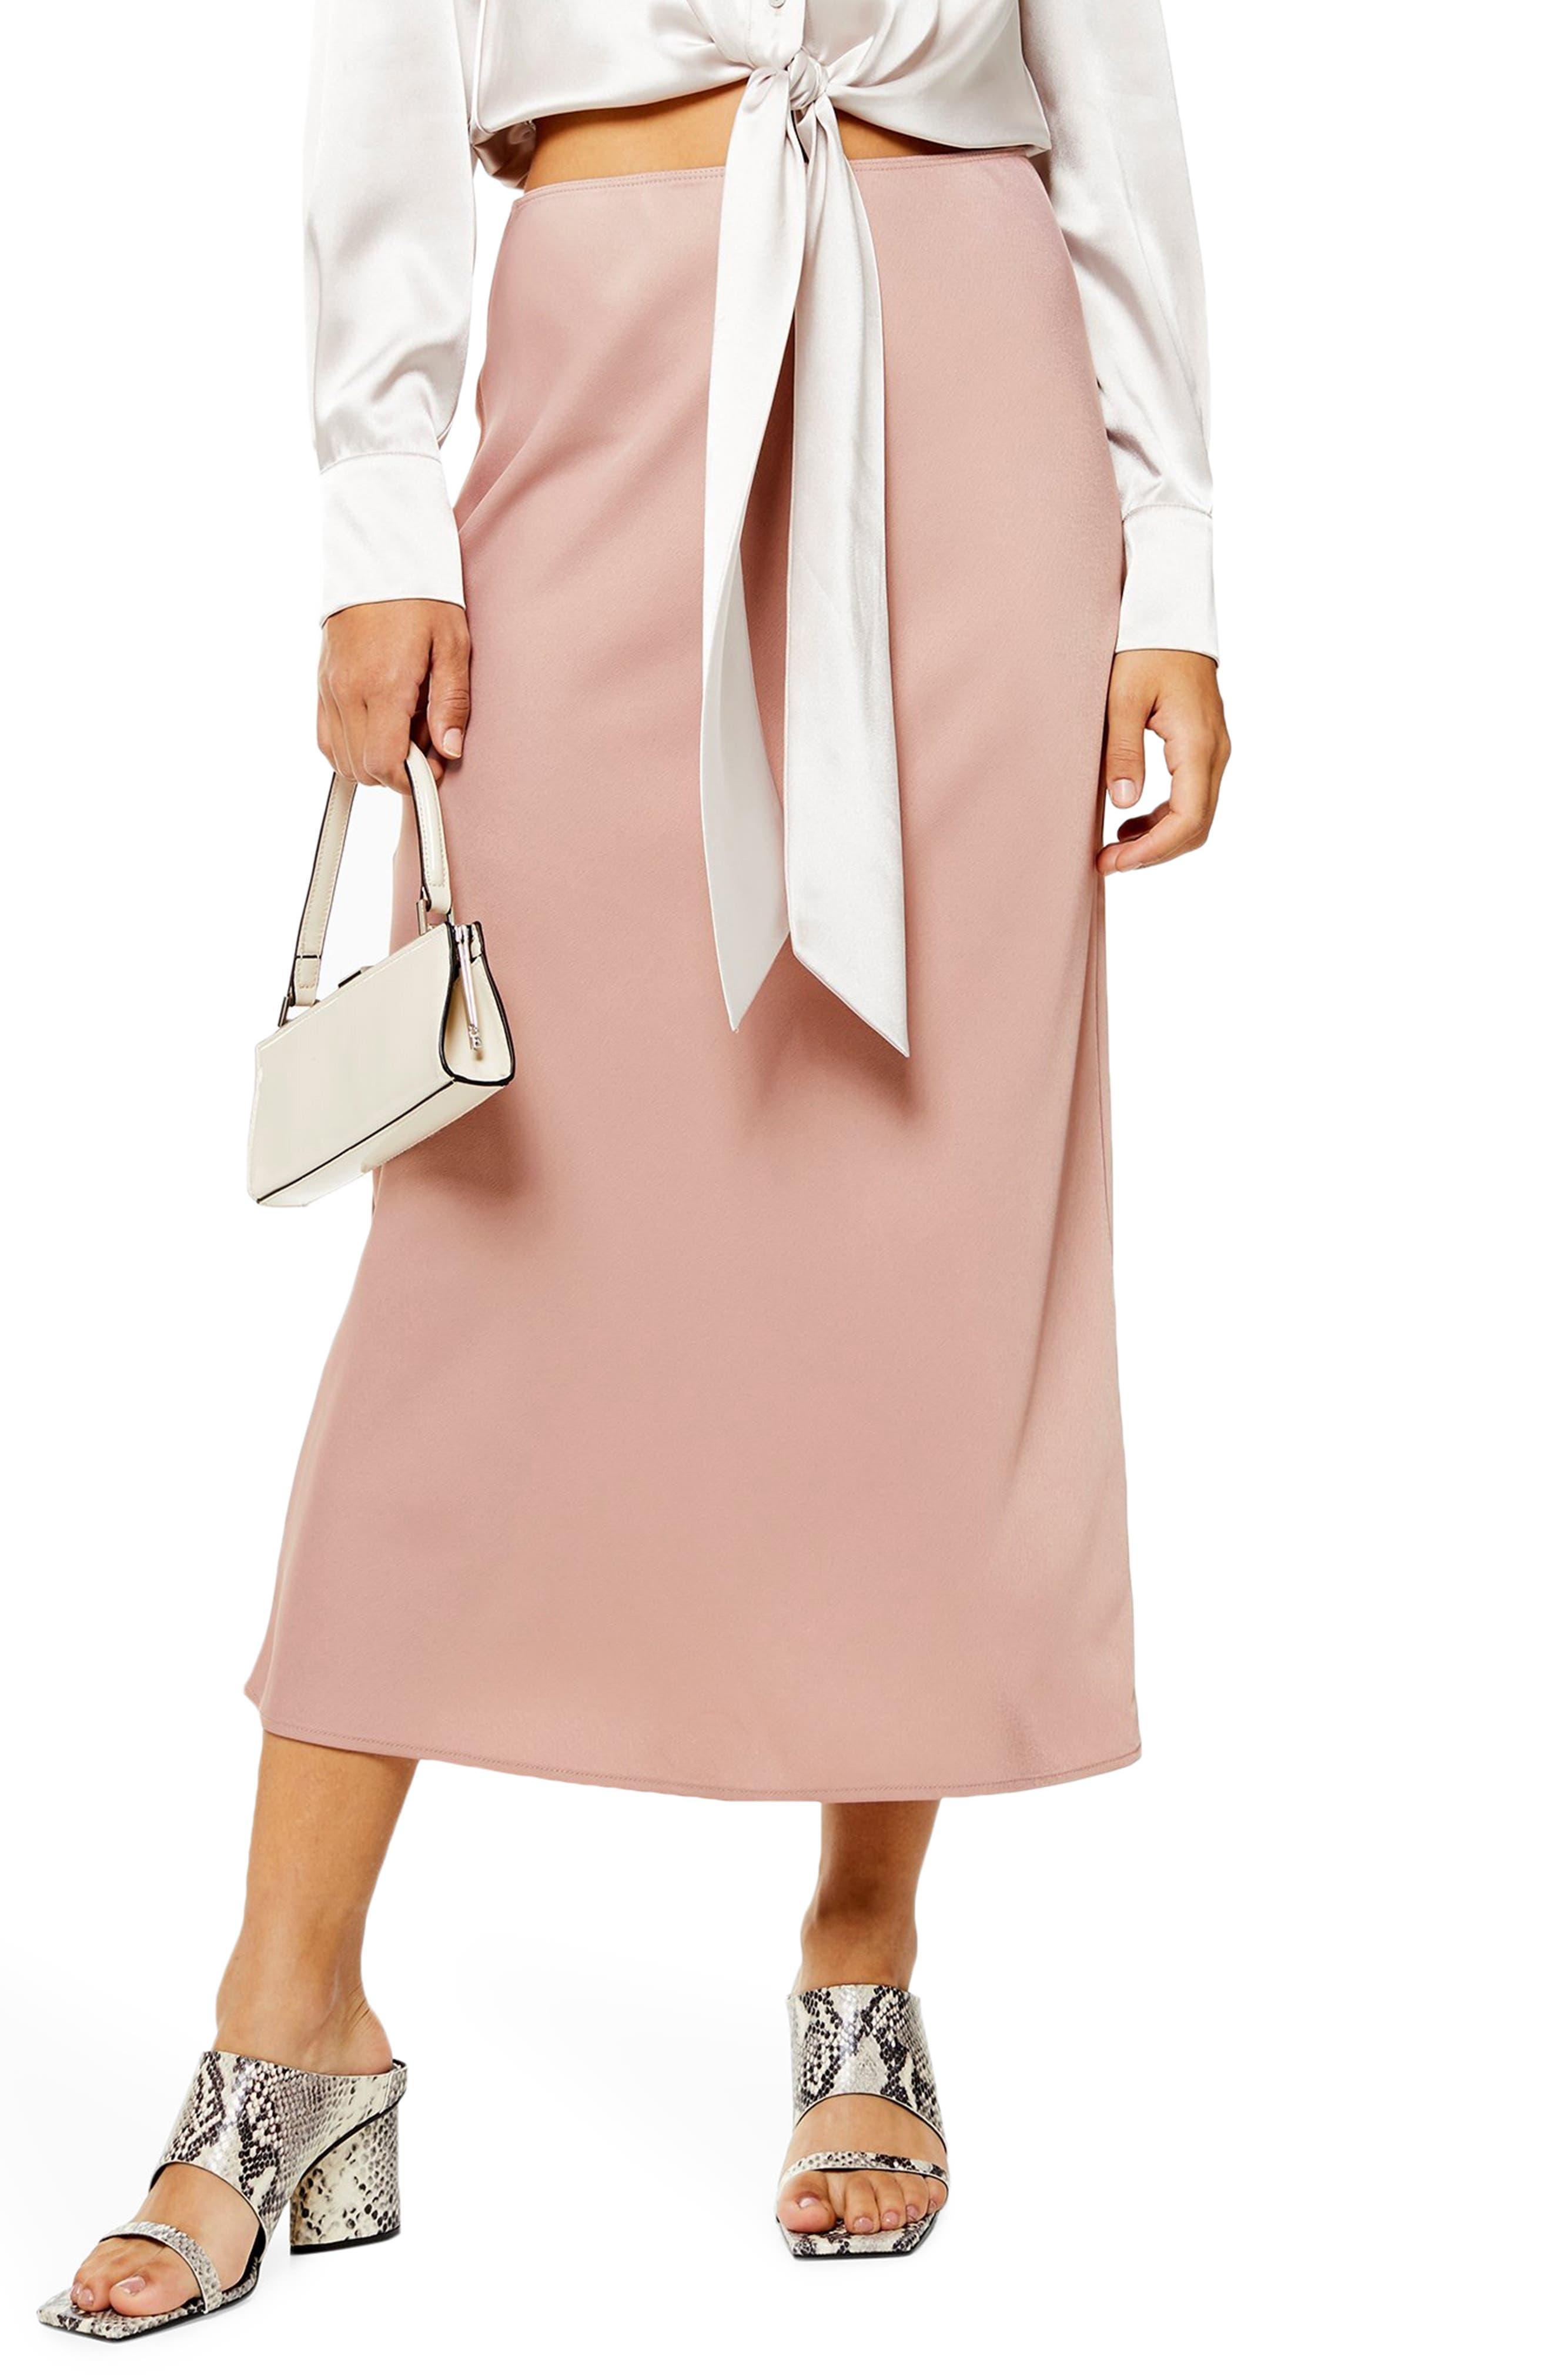 Topshop Matte Satin Bias Cut Skirt, US (fits like 0) - Pink